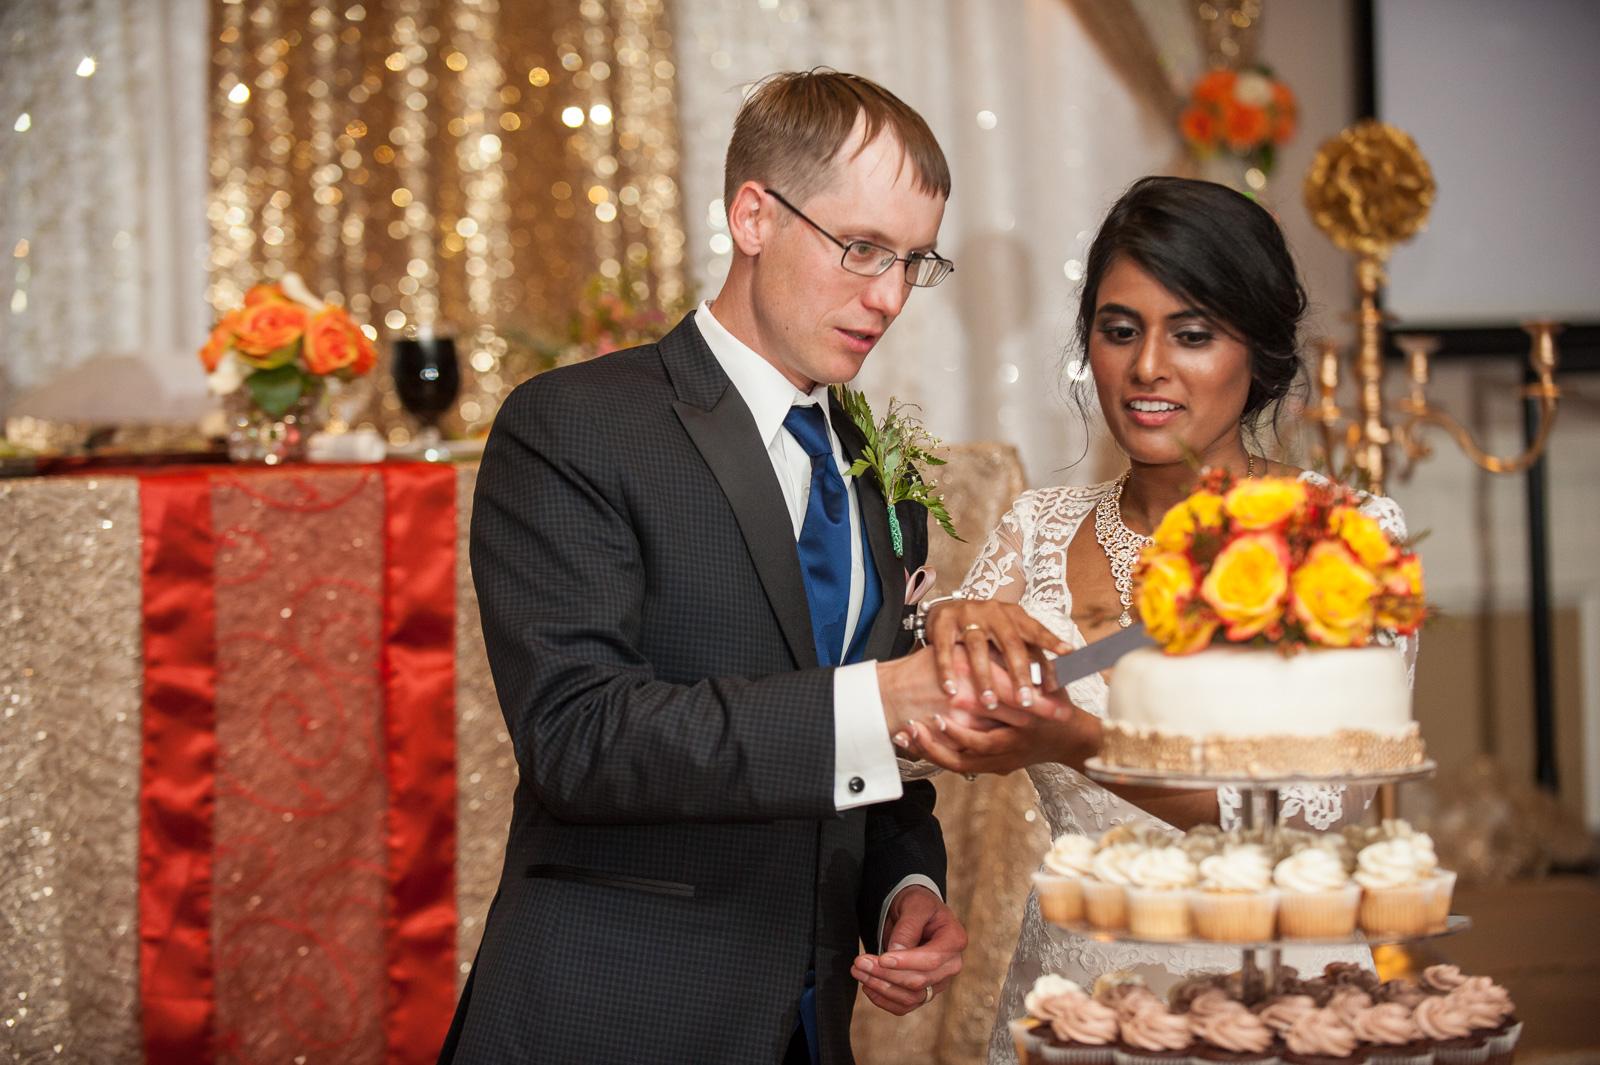 bc-wedding-photographers-paradise-banquet-hall-wedding-33.jpg